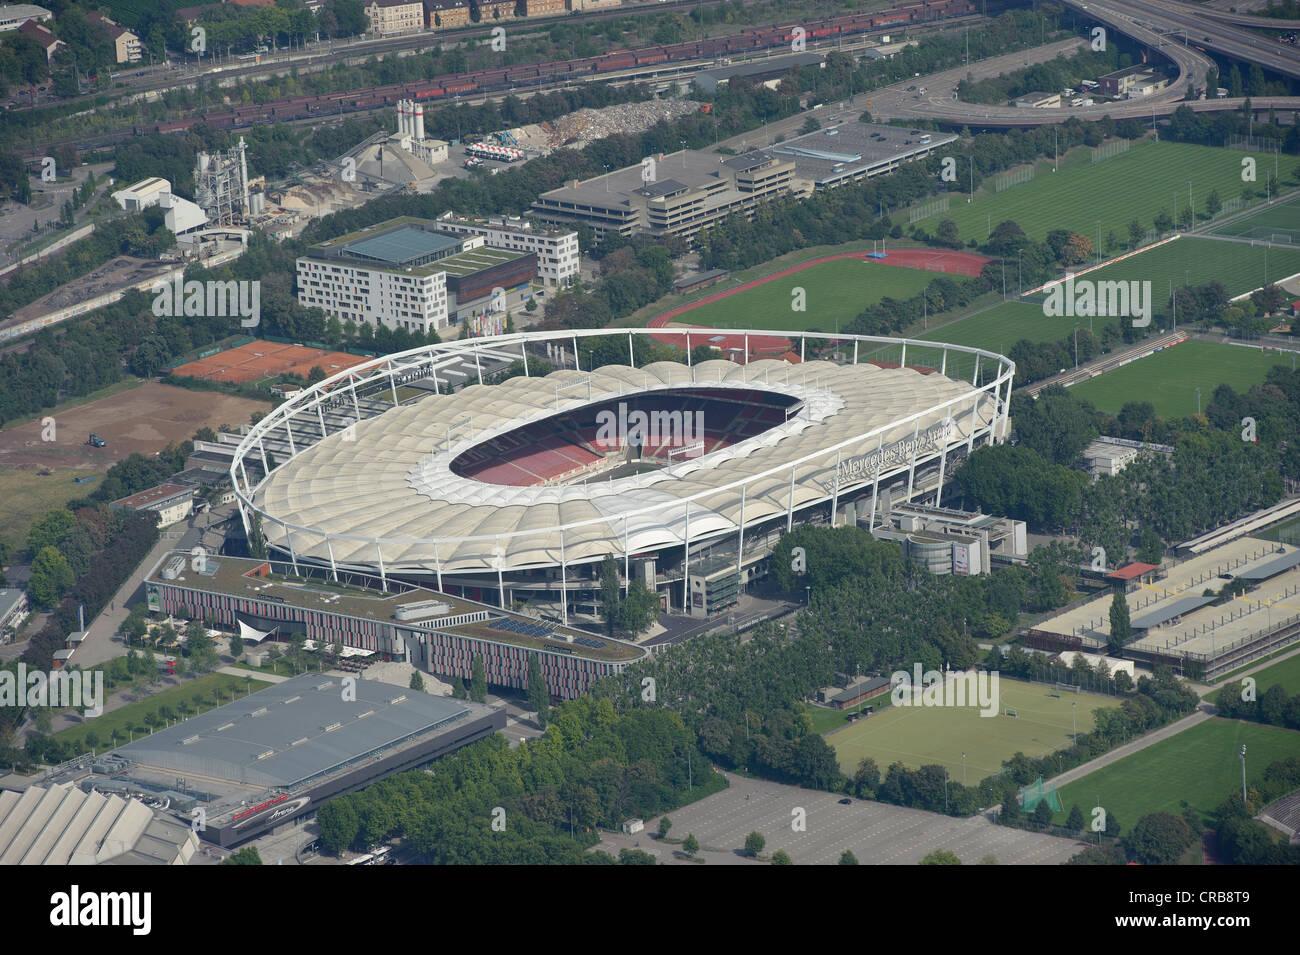 Aerial View Neckarpark Vfb Stuttgart Football Stadium